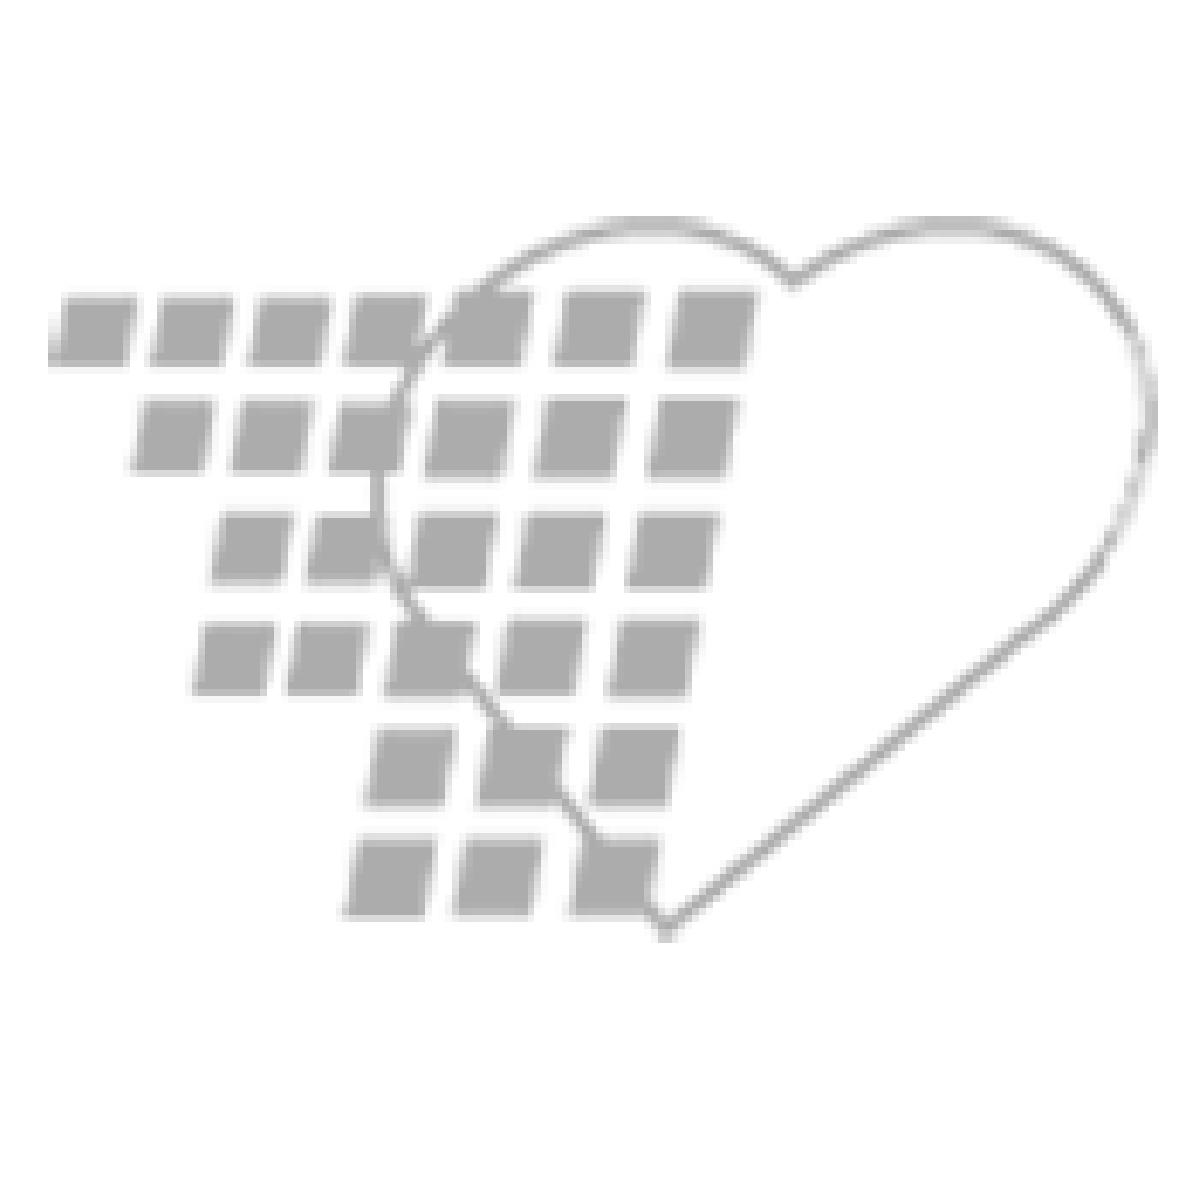 11-81-0987 Nasco Life/form® Breast Examination Simulator